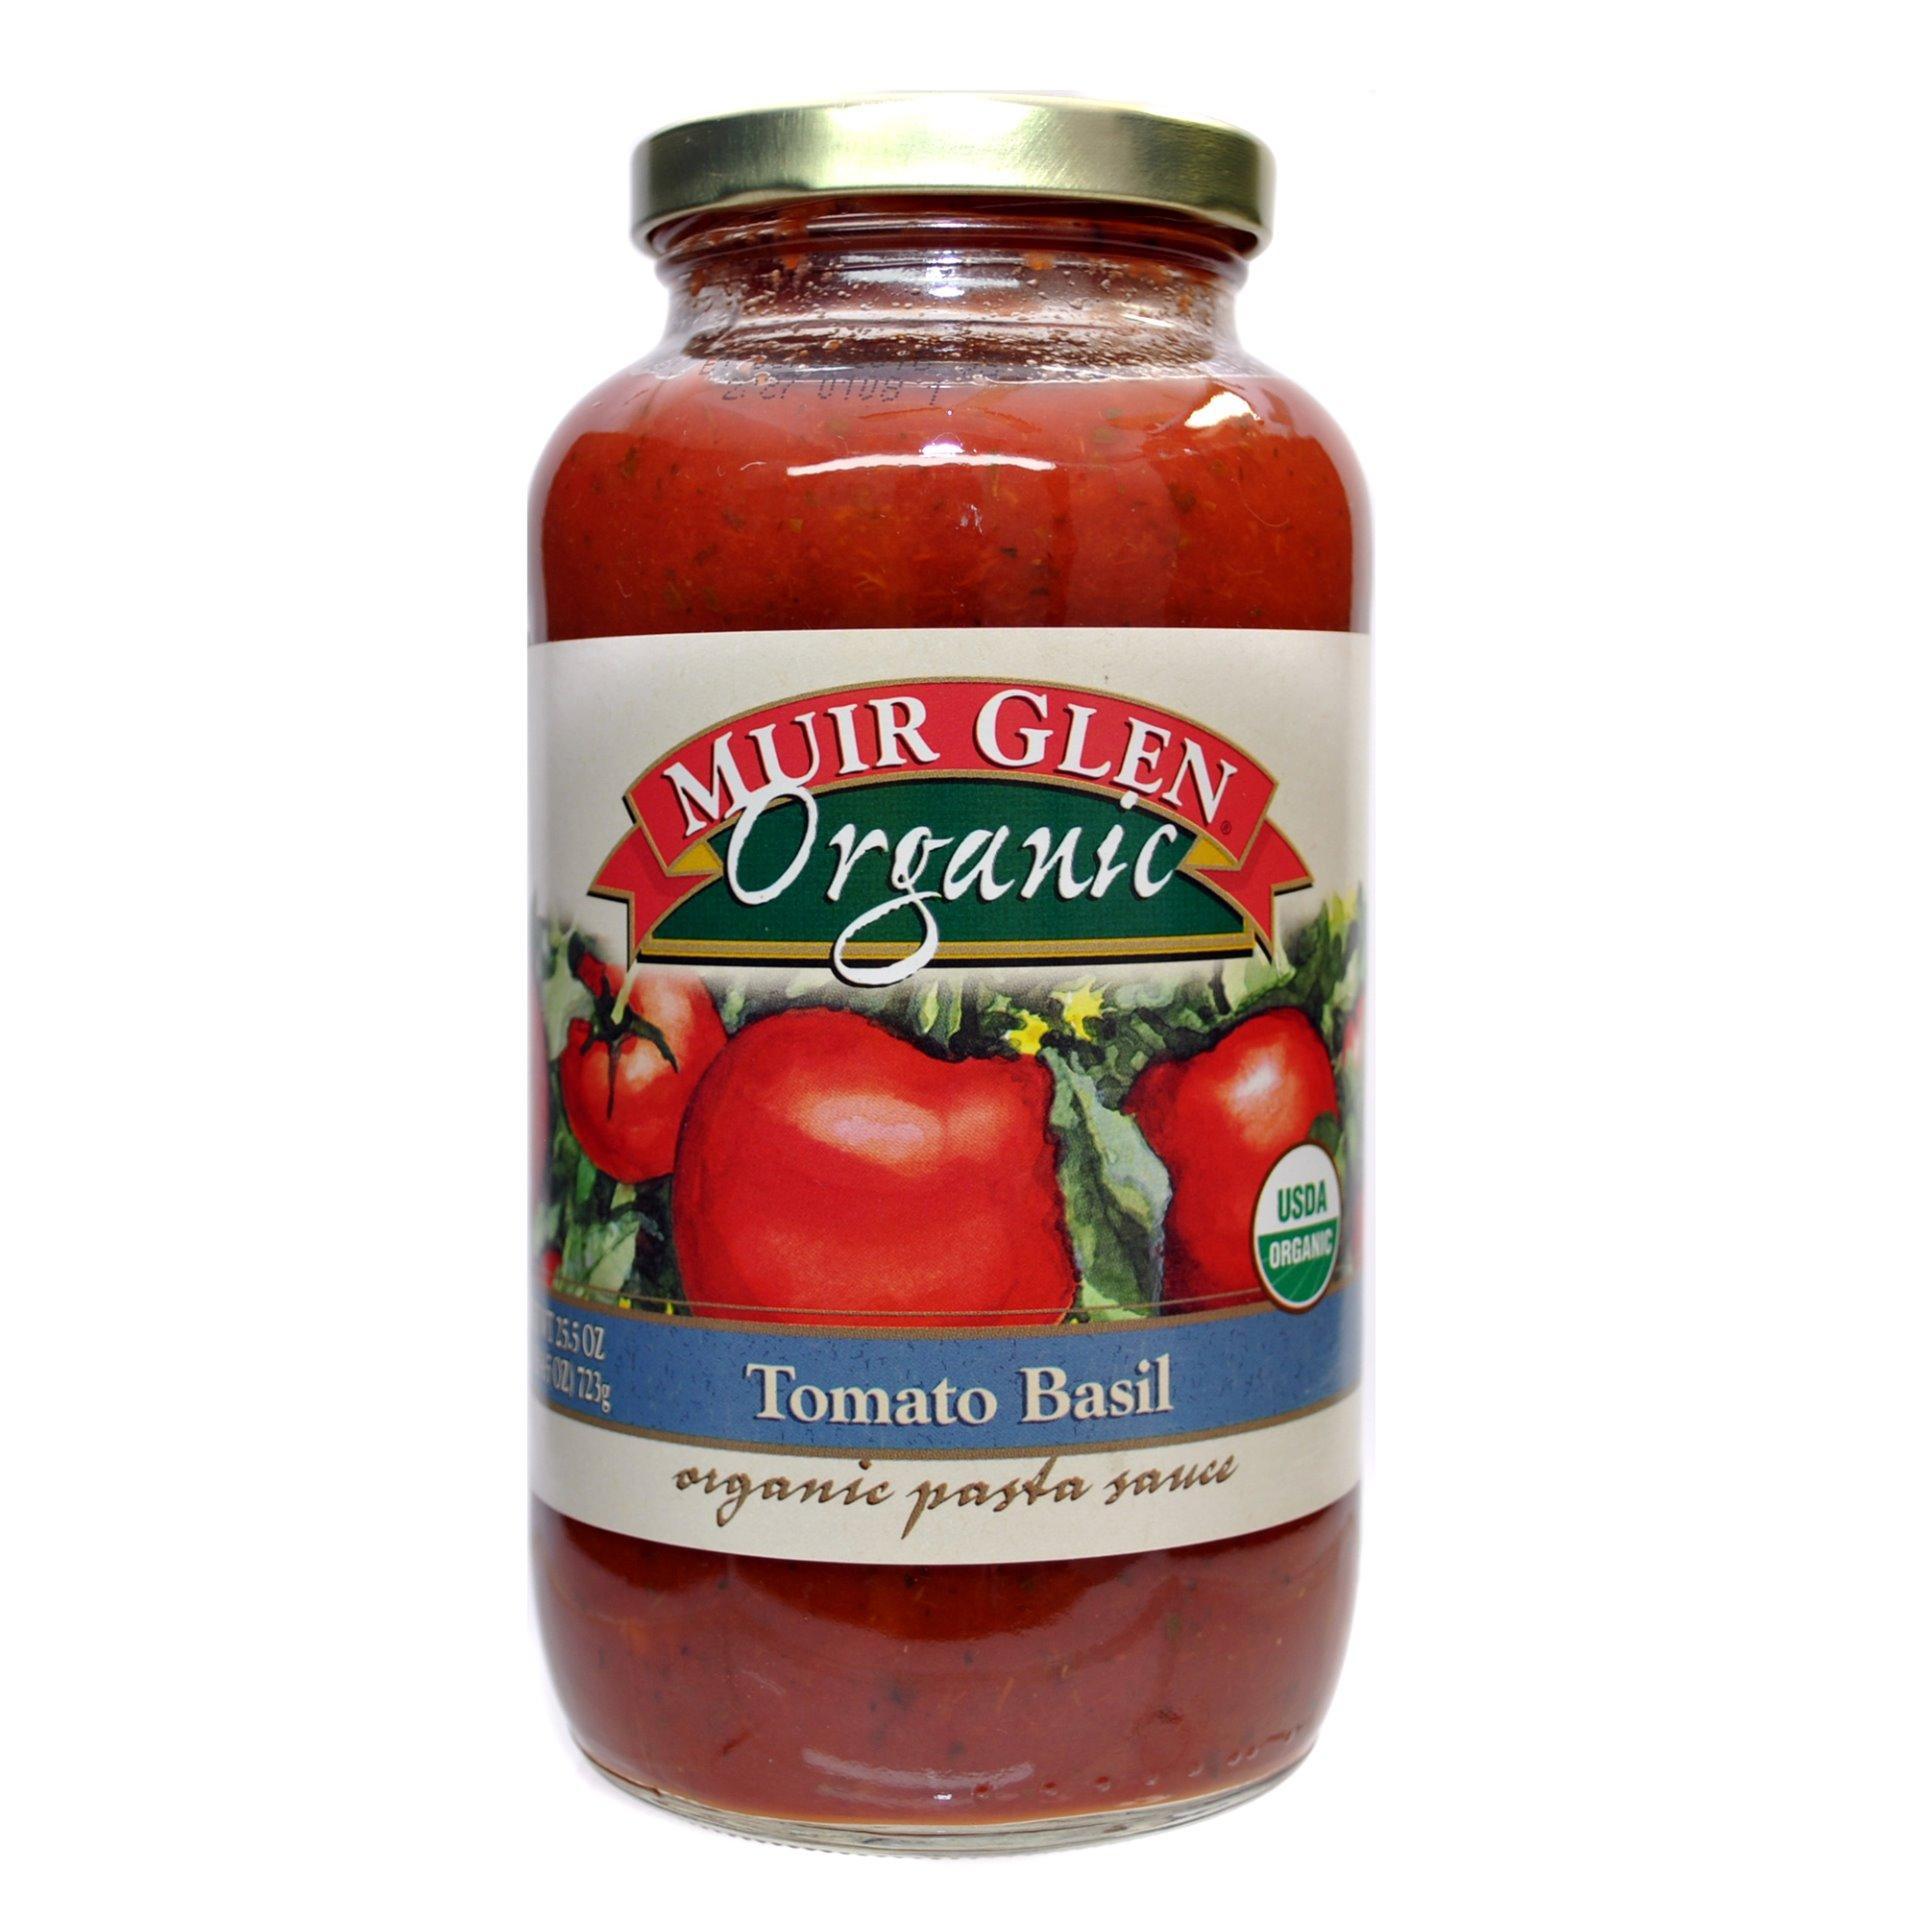 Muir Glen Tomato Sauce  MUIR GLEN Organic Tomato Basil Pasta Sauce 723g